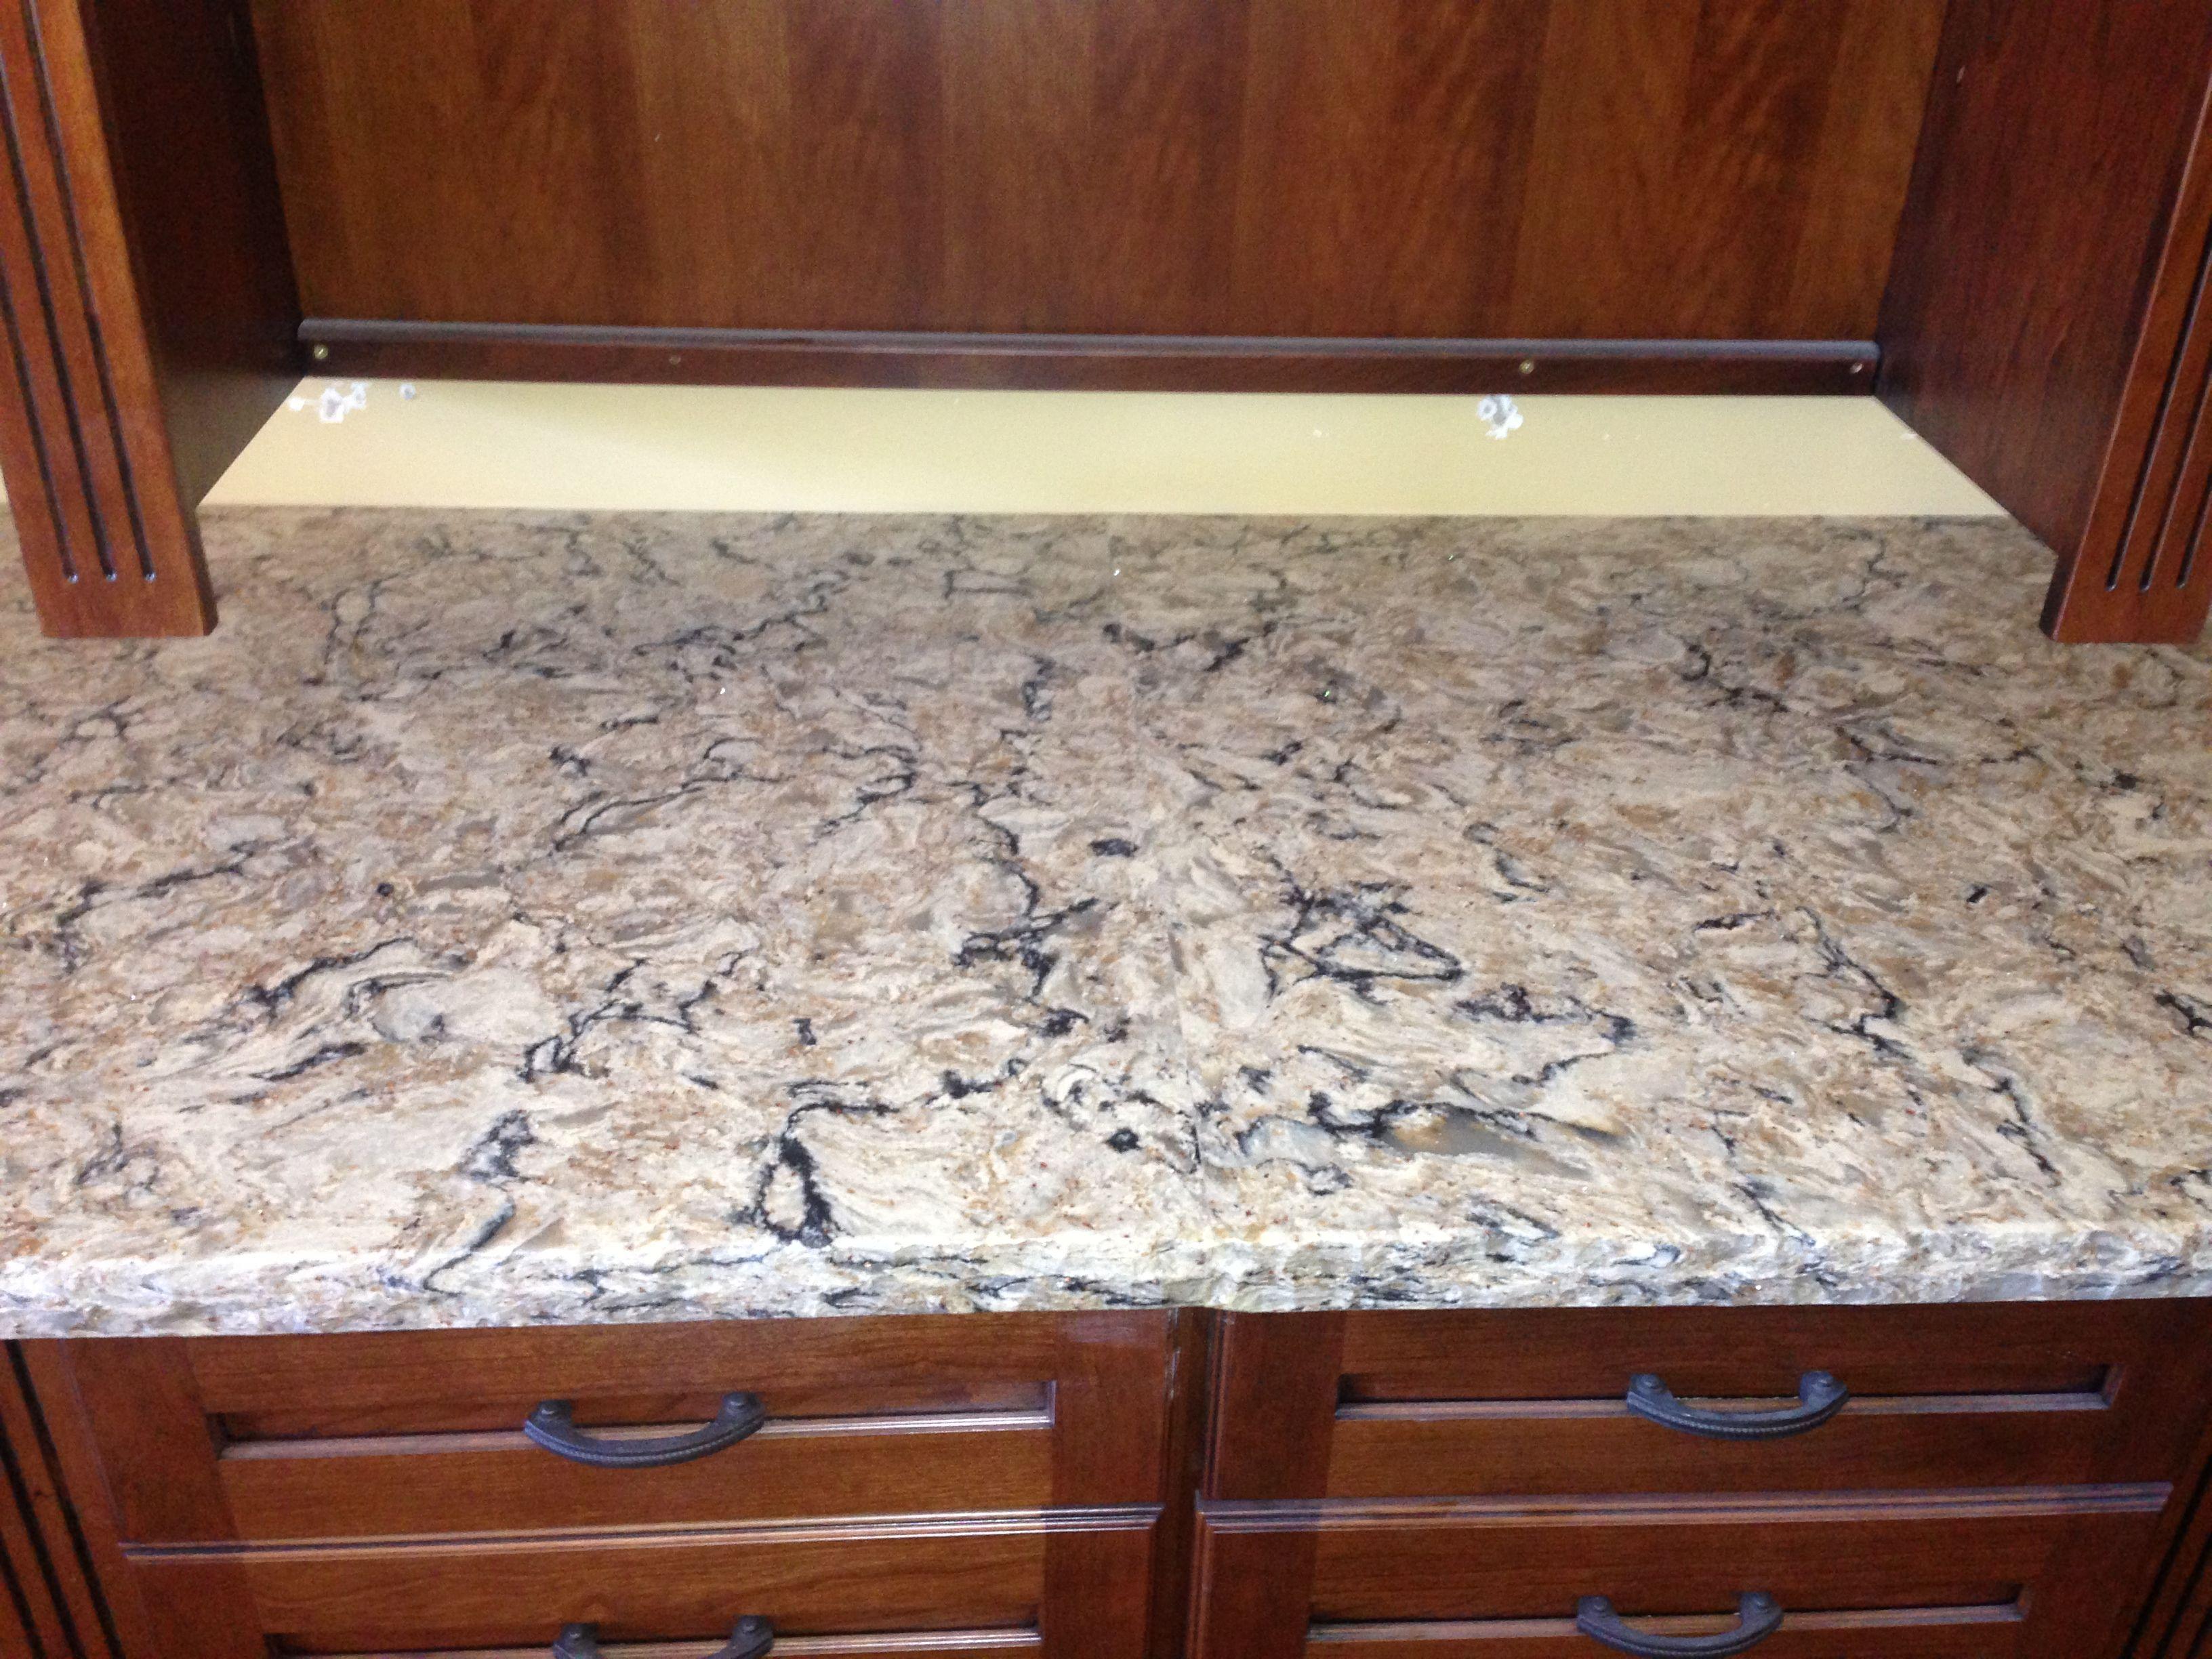 quartz countertops k southern supply devon cambria torquay in lr countertop kitchen inspiration